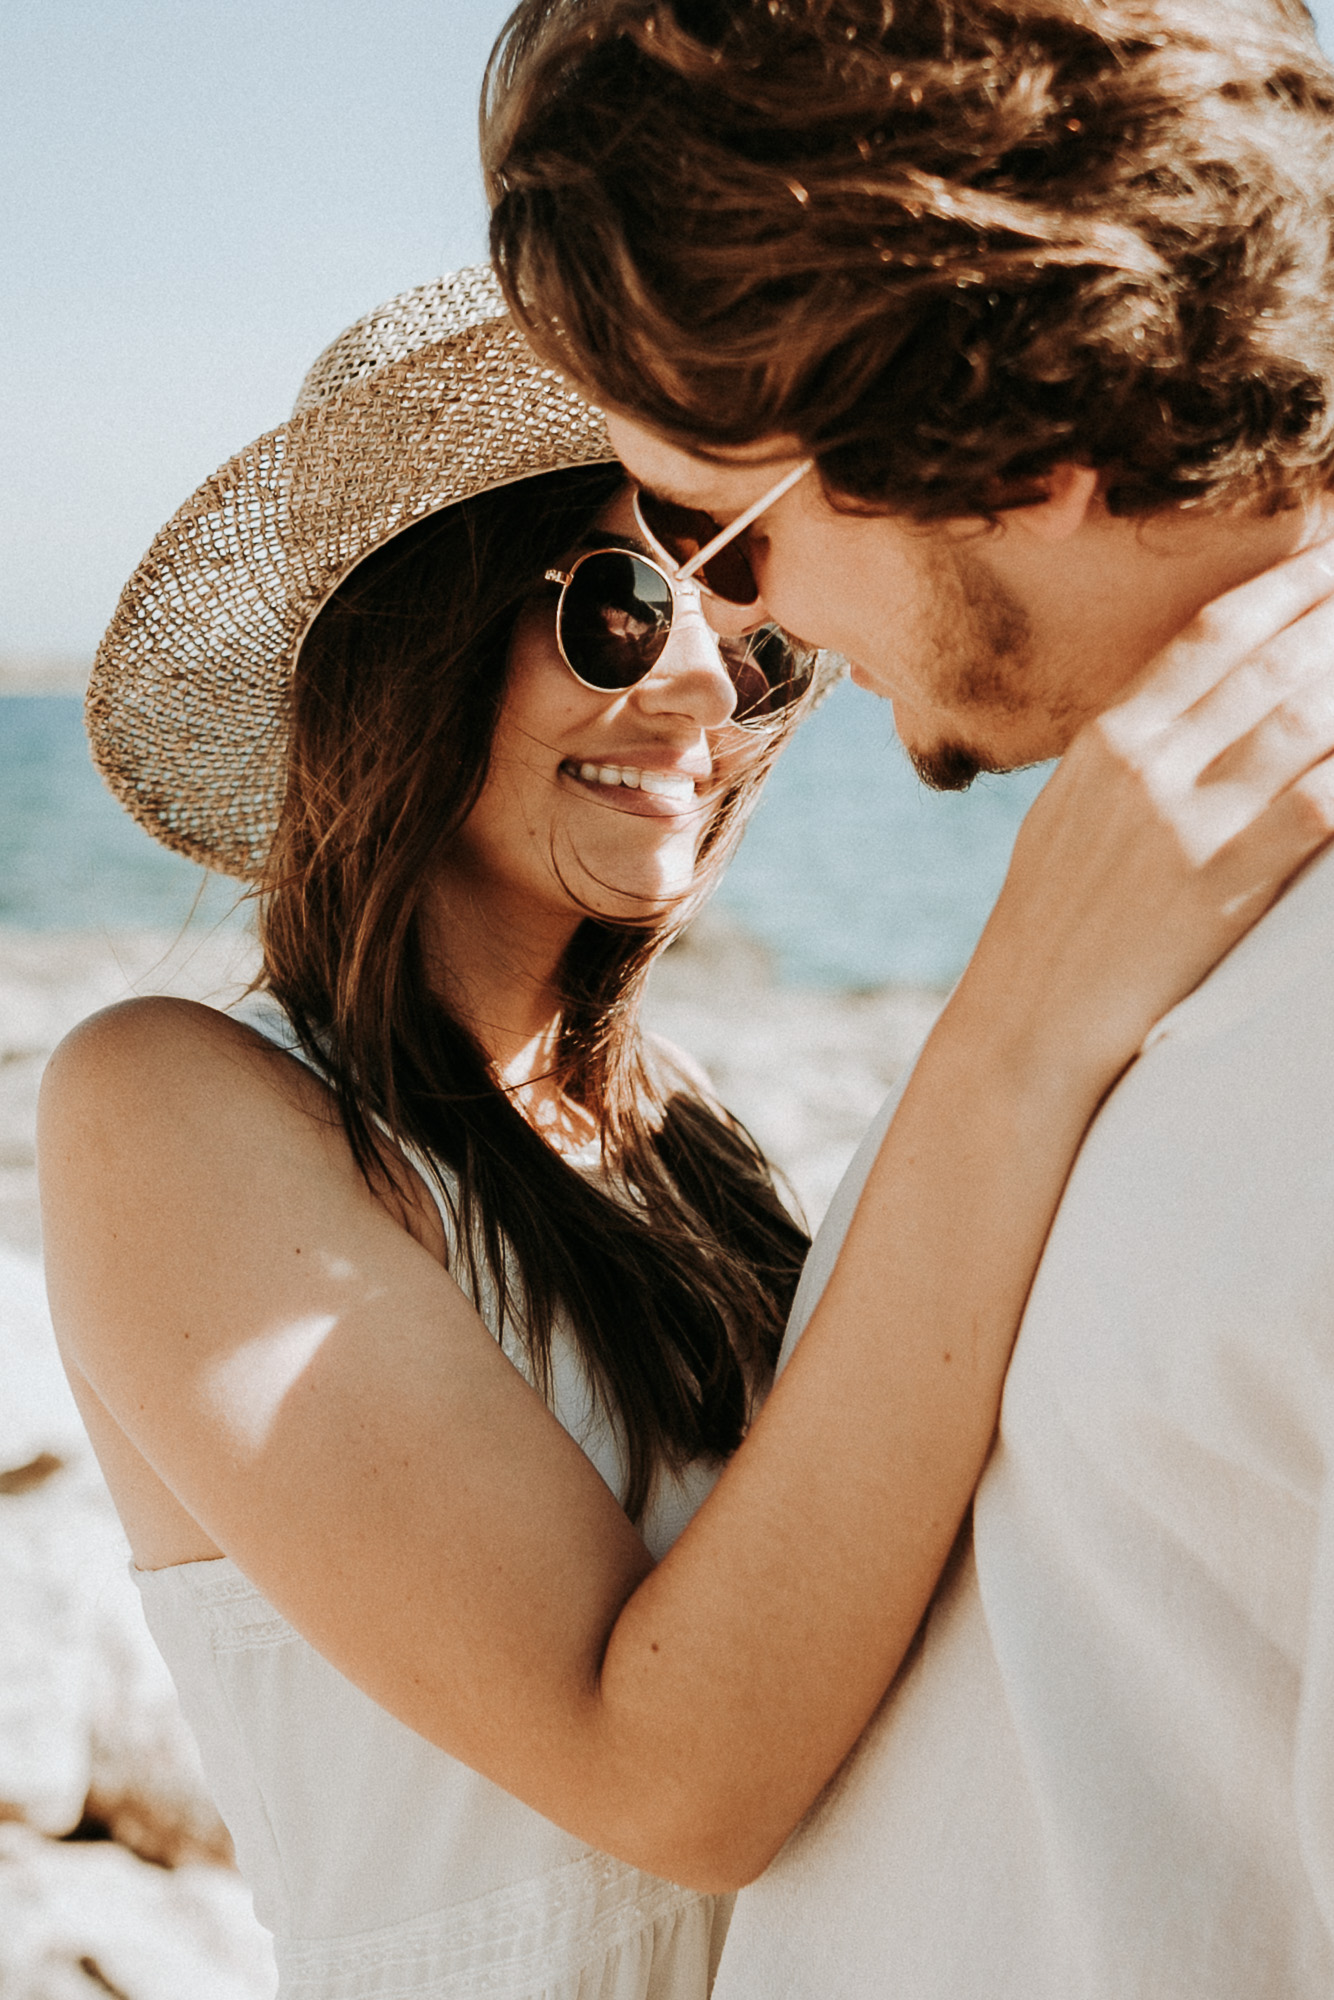 DanielaMarquardtPhotography_wedding_elopement_mallorca_spain_stjordi_sessalines_marinaandxavi379